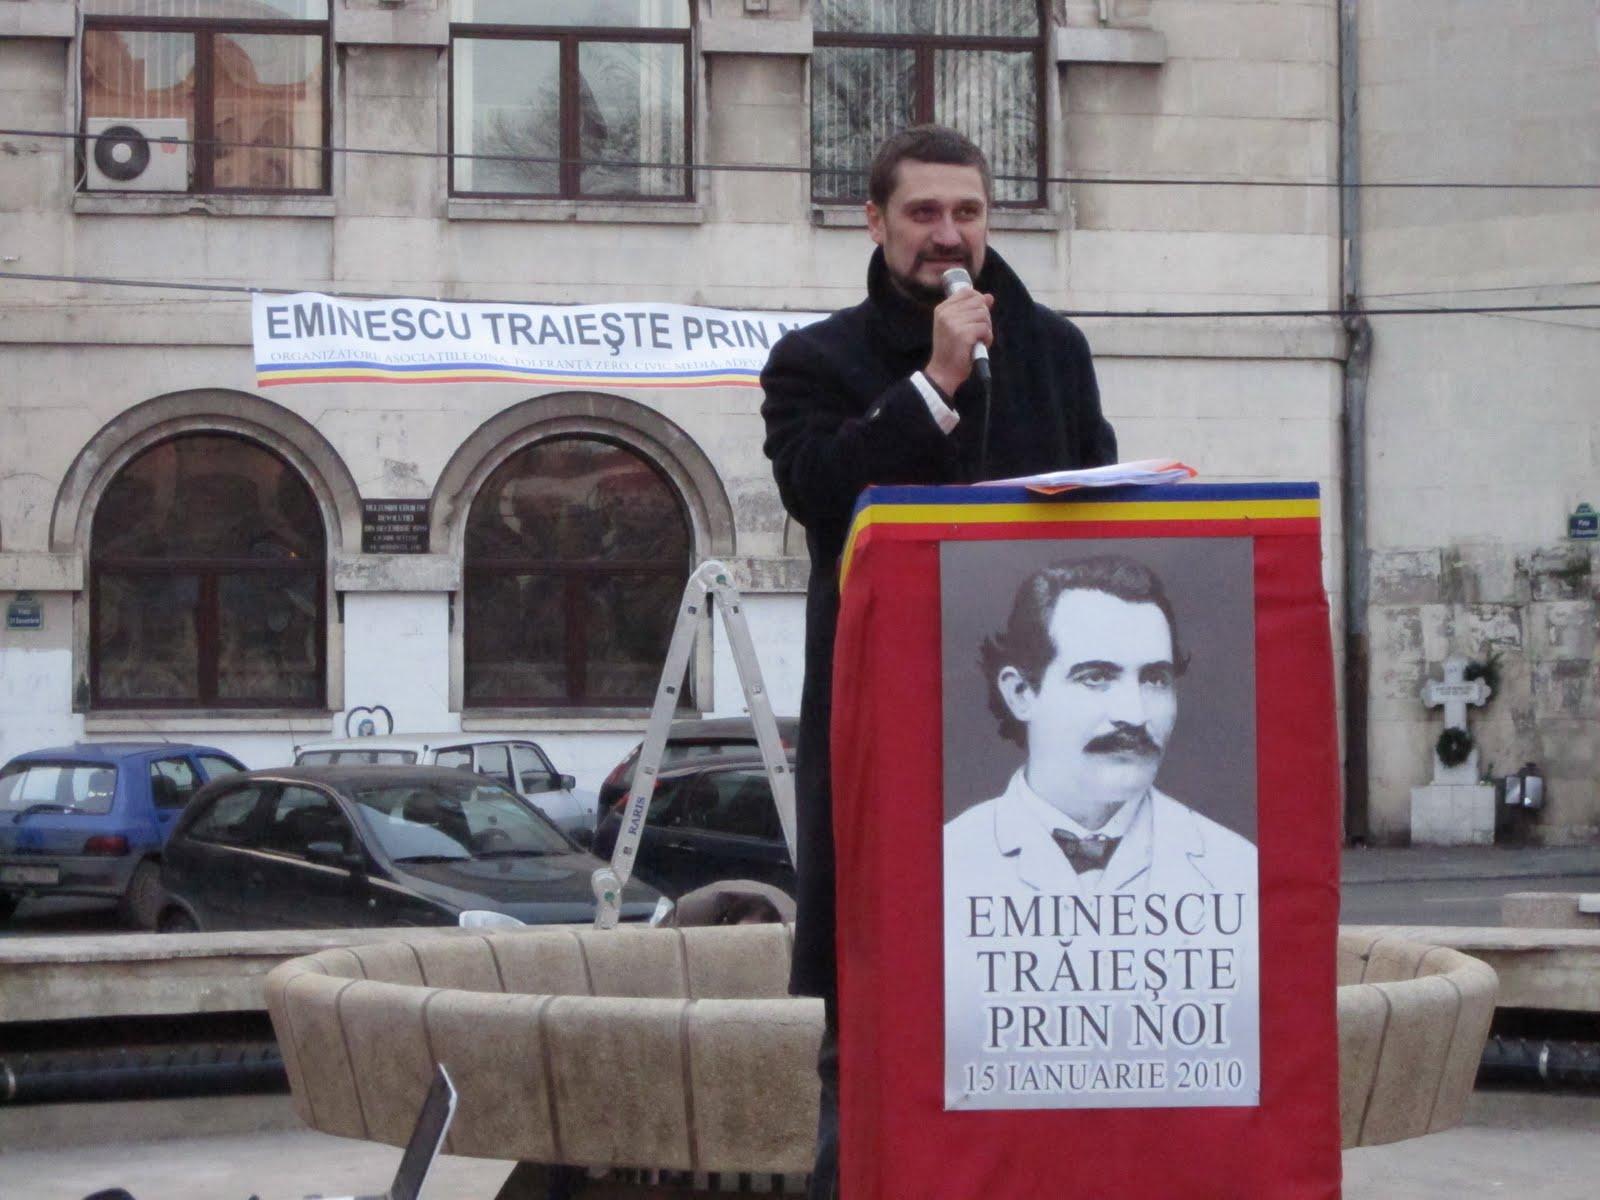 [Actiunea+Eminescu+traieste+prin+noi+2010+Piata+Universitatii+Mihai+Rapcea.JPG]